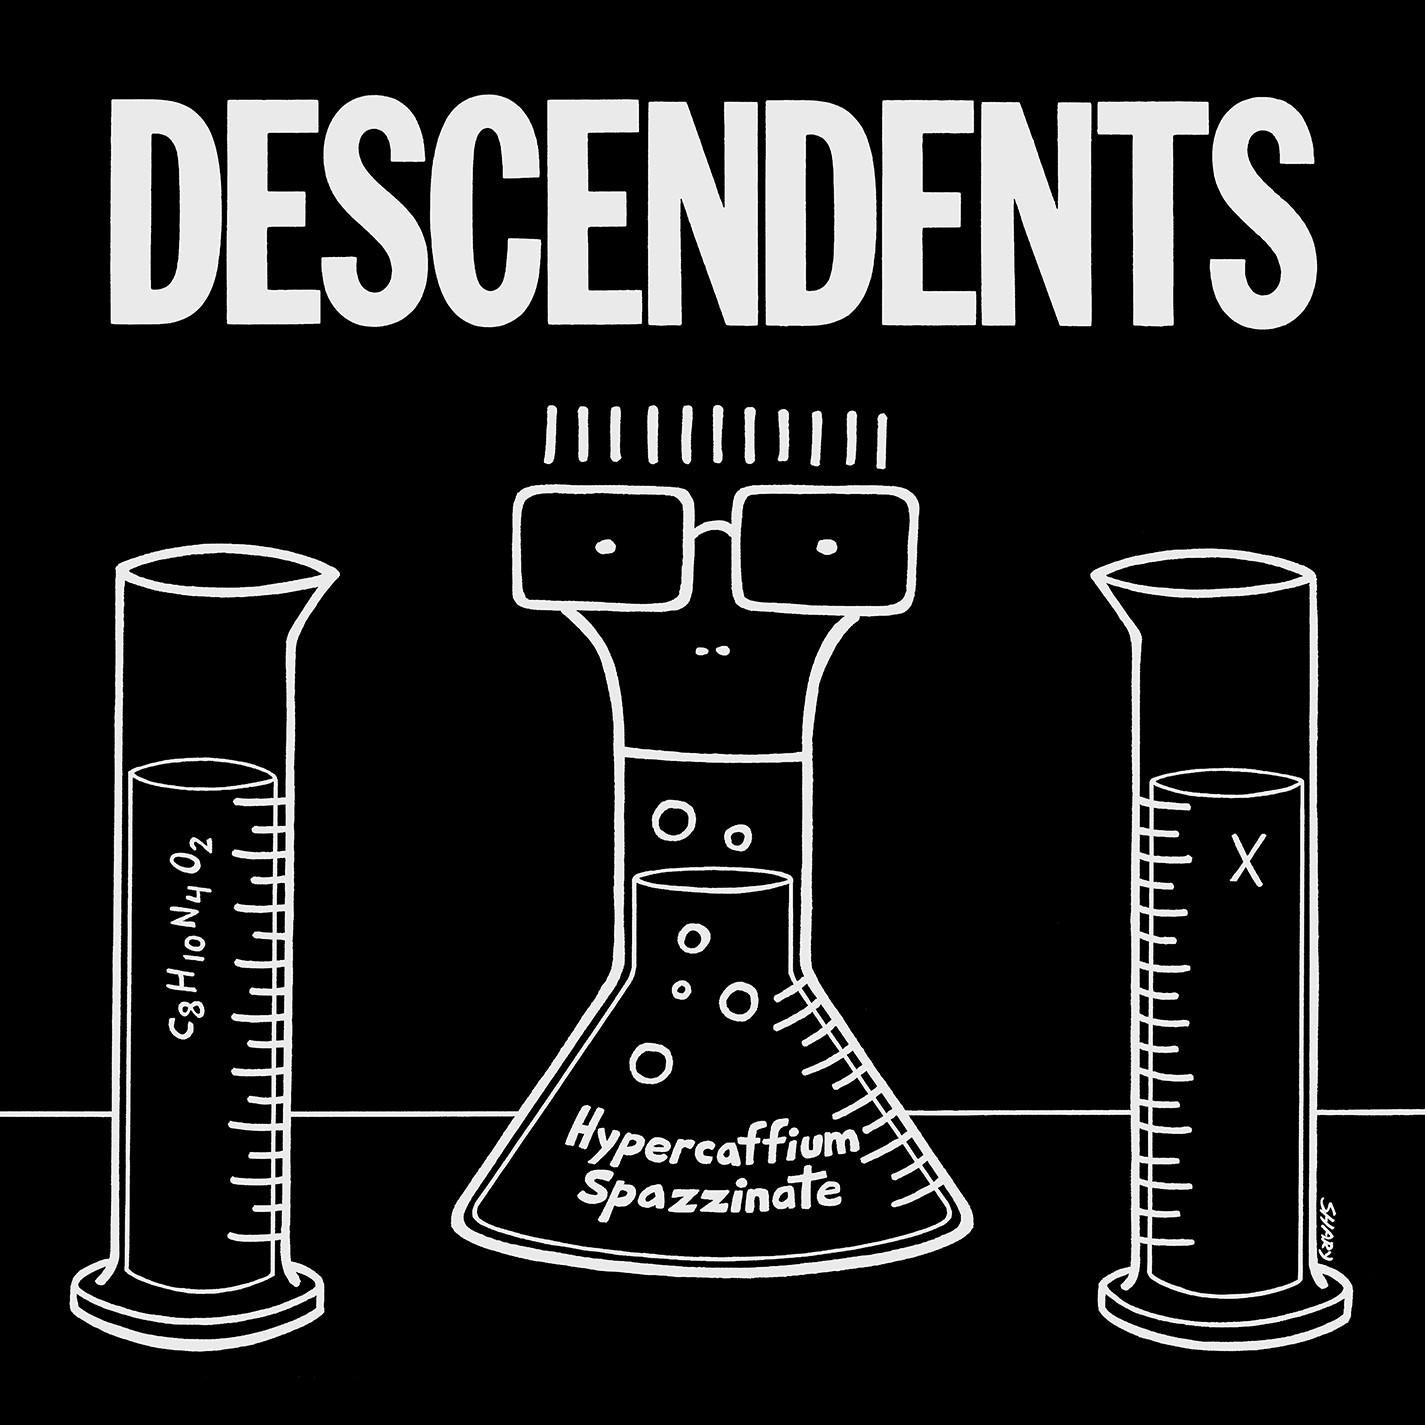 The Descendents - Hypercaffium Spazzinate LP